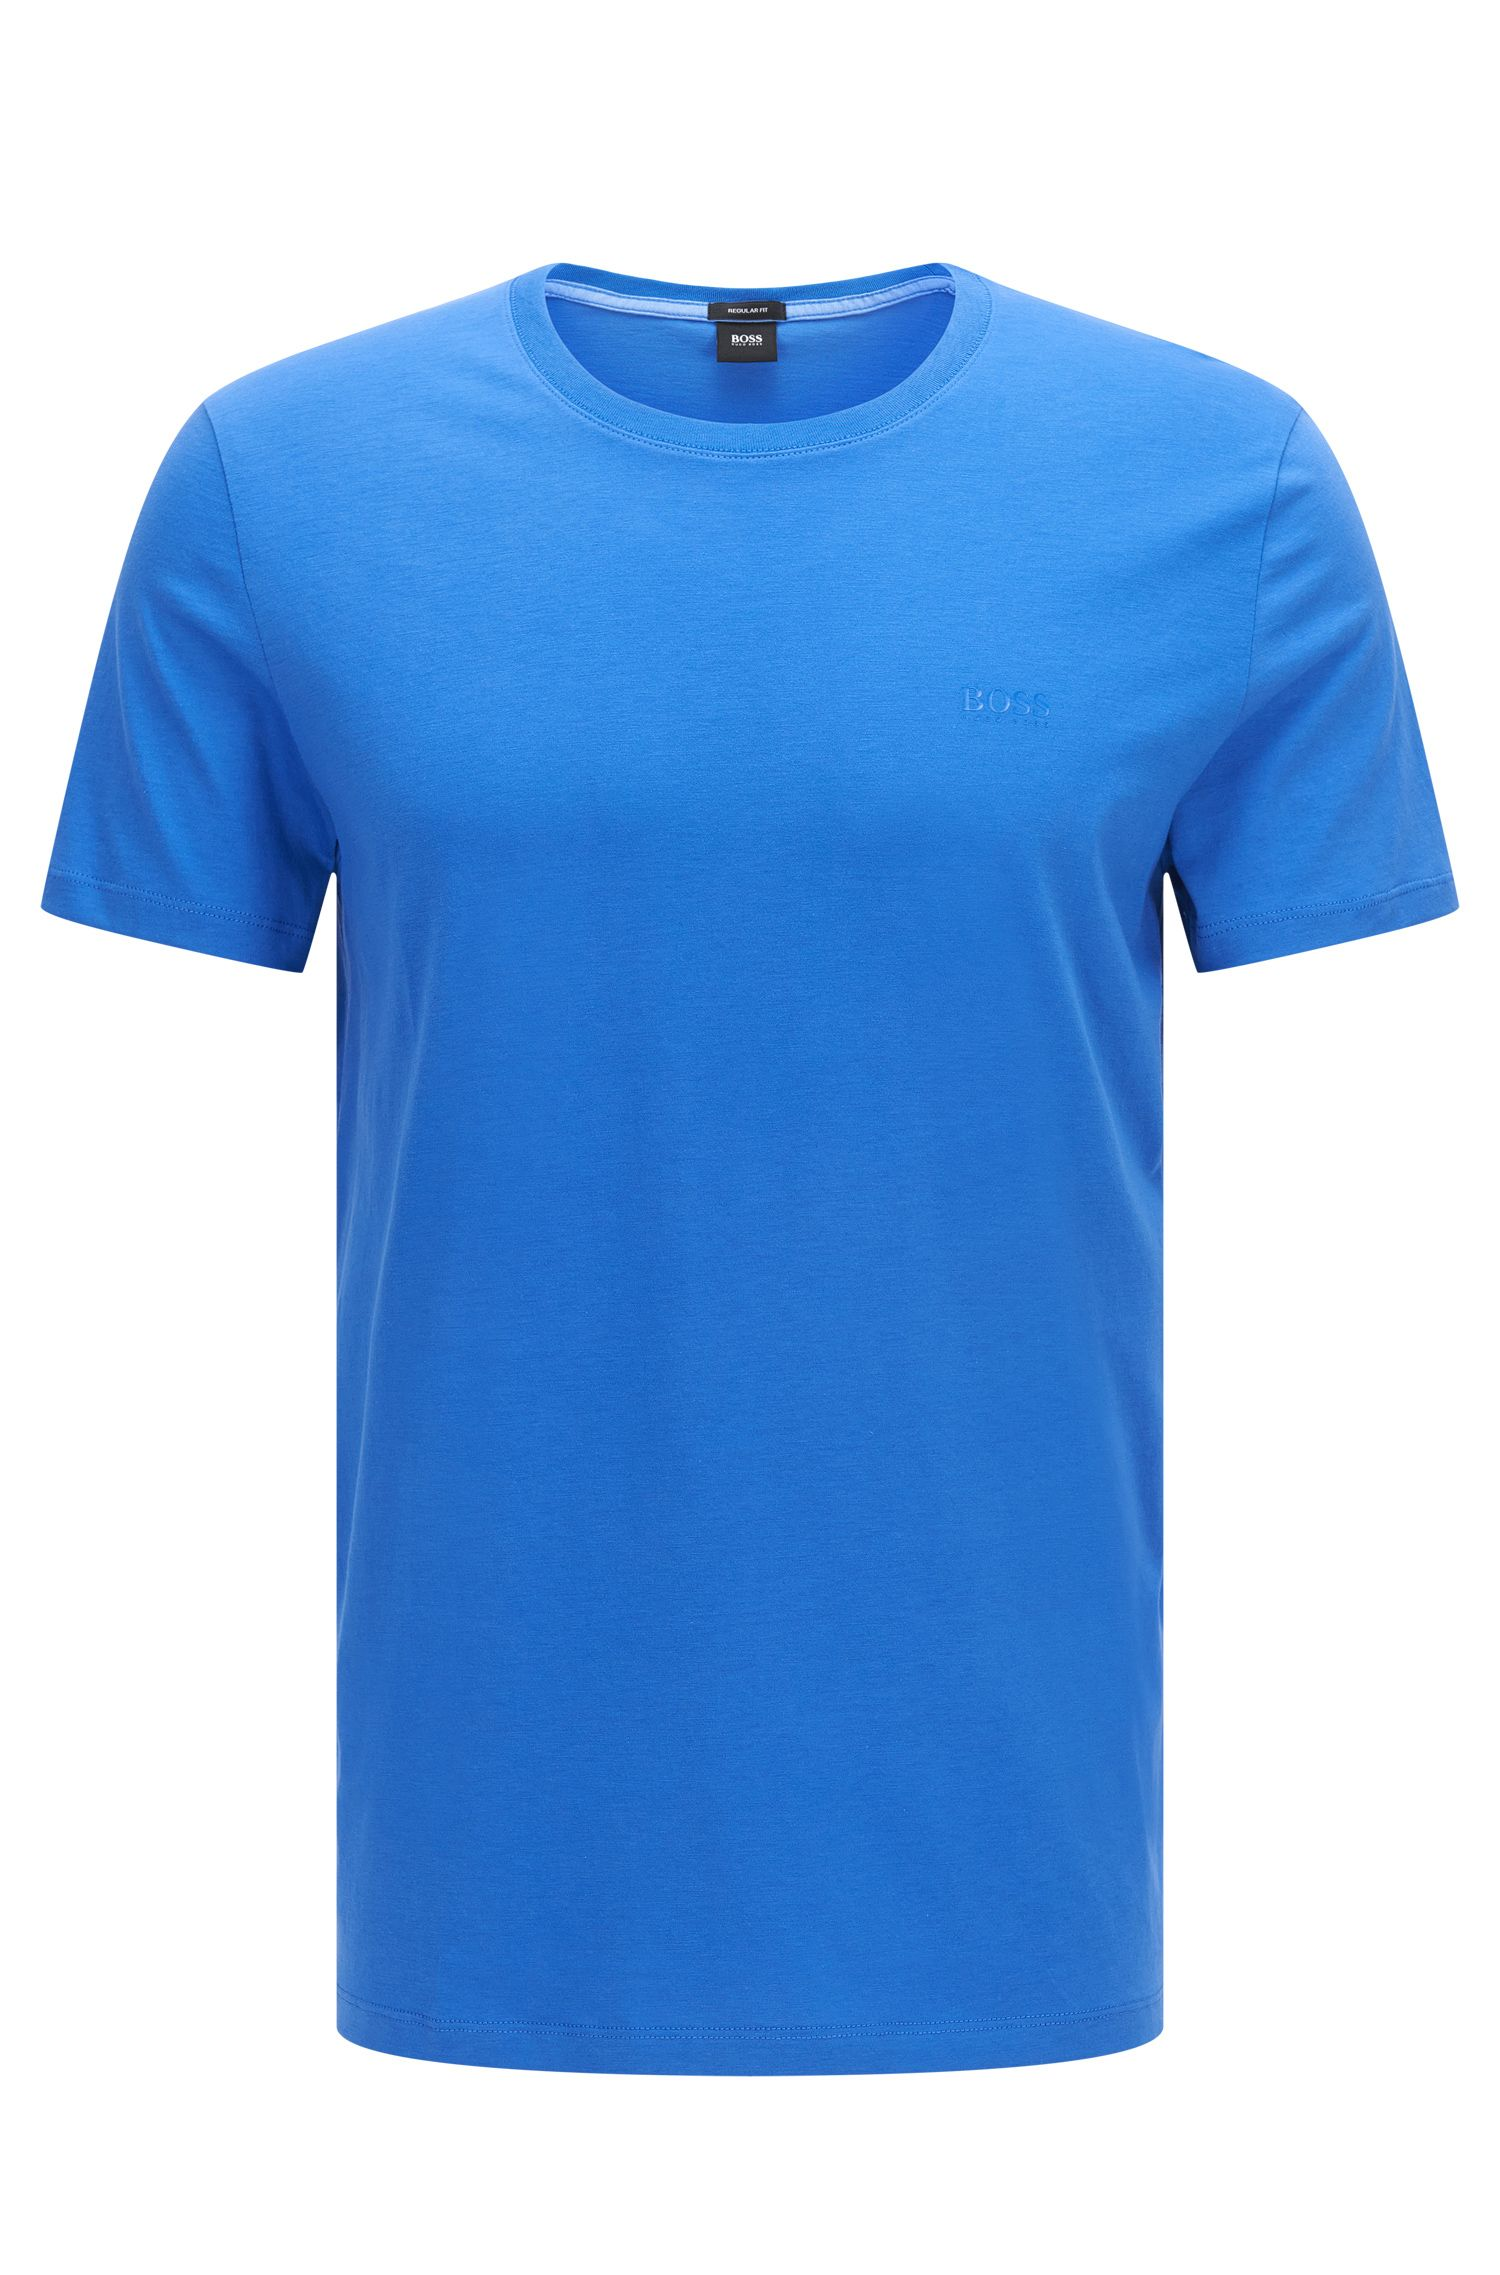 Unifarbenes Regular-T-Shirt aus Baumwolle: 'Tiburt 33'